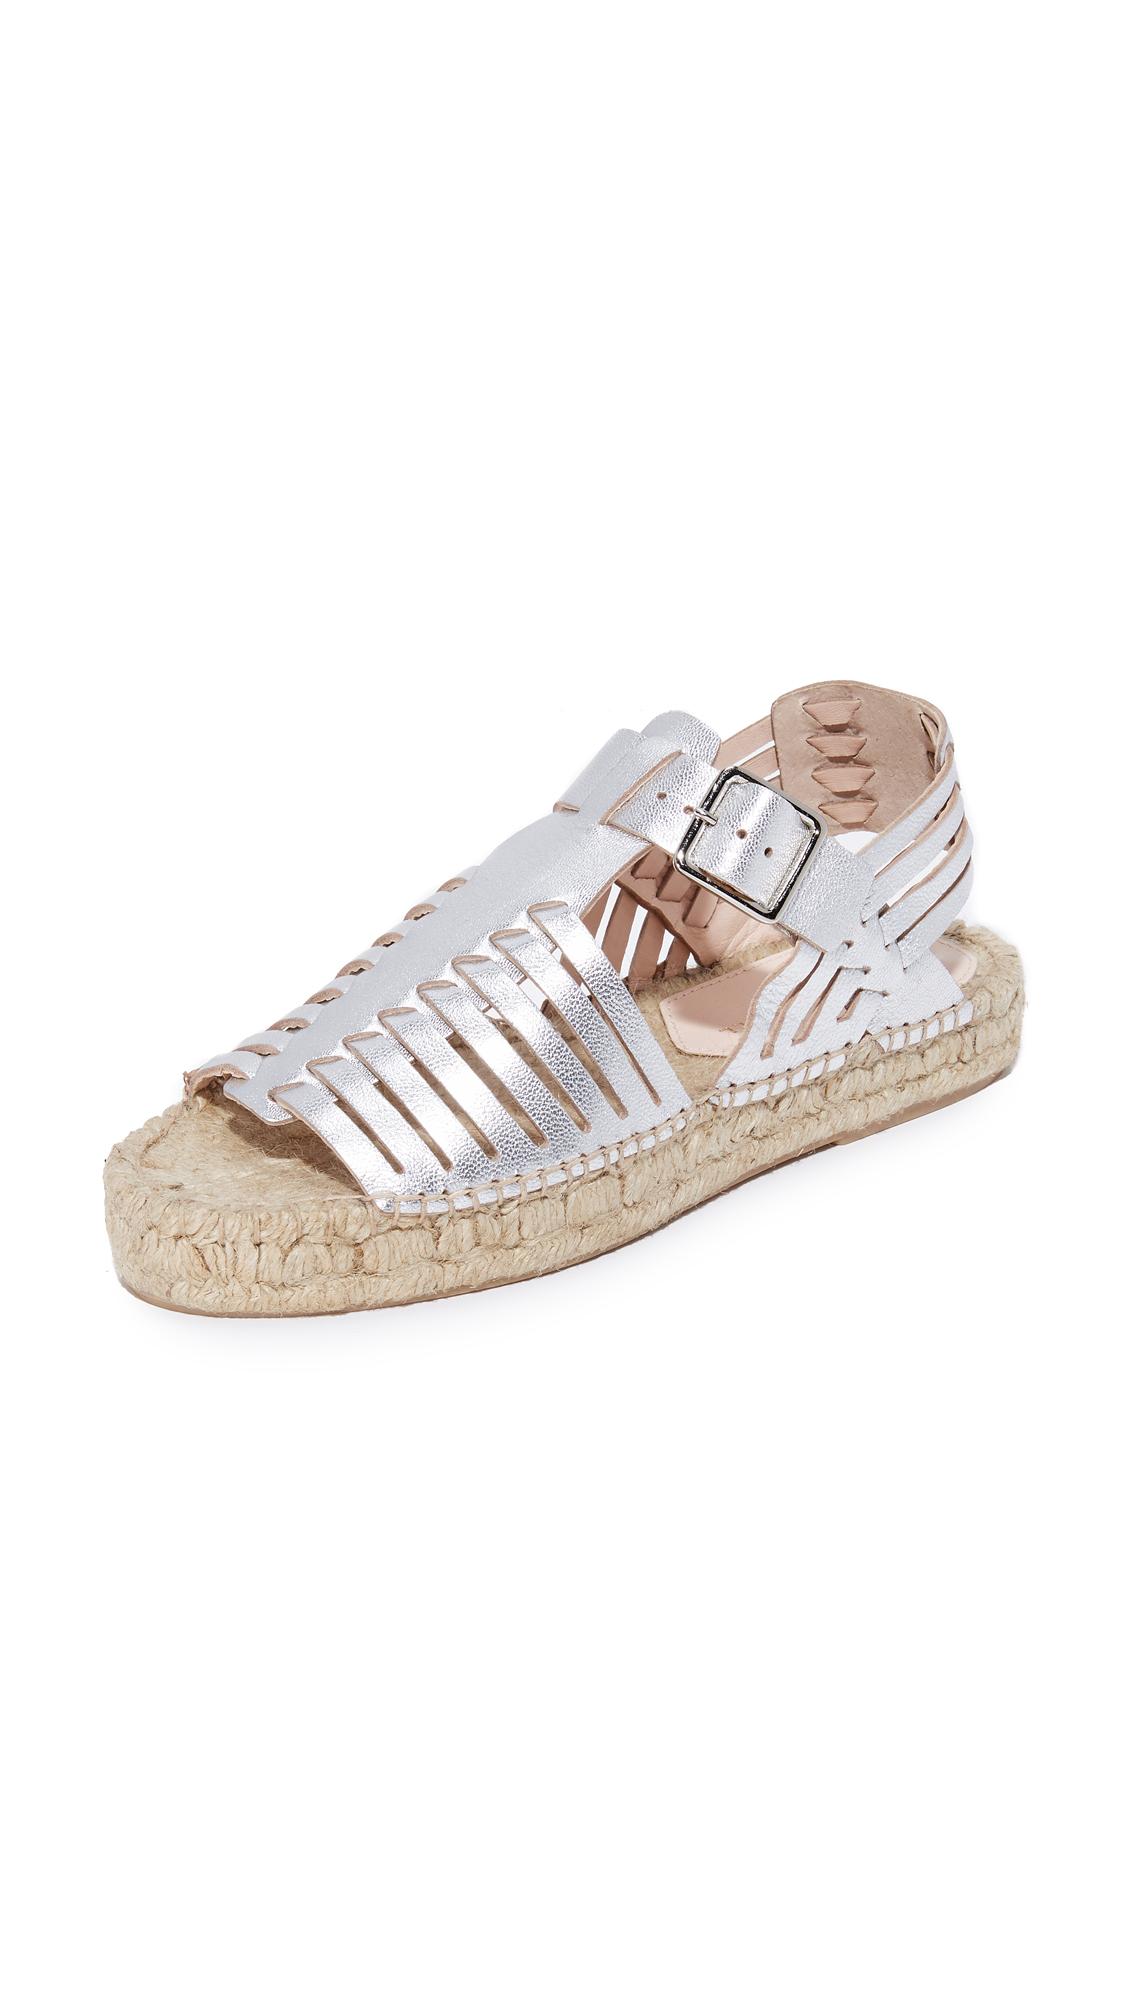 Loeffler Randall Reid Platform Sandals - Silver